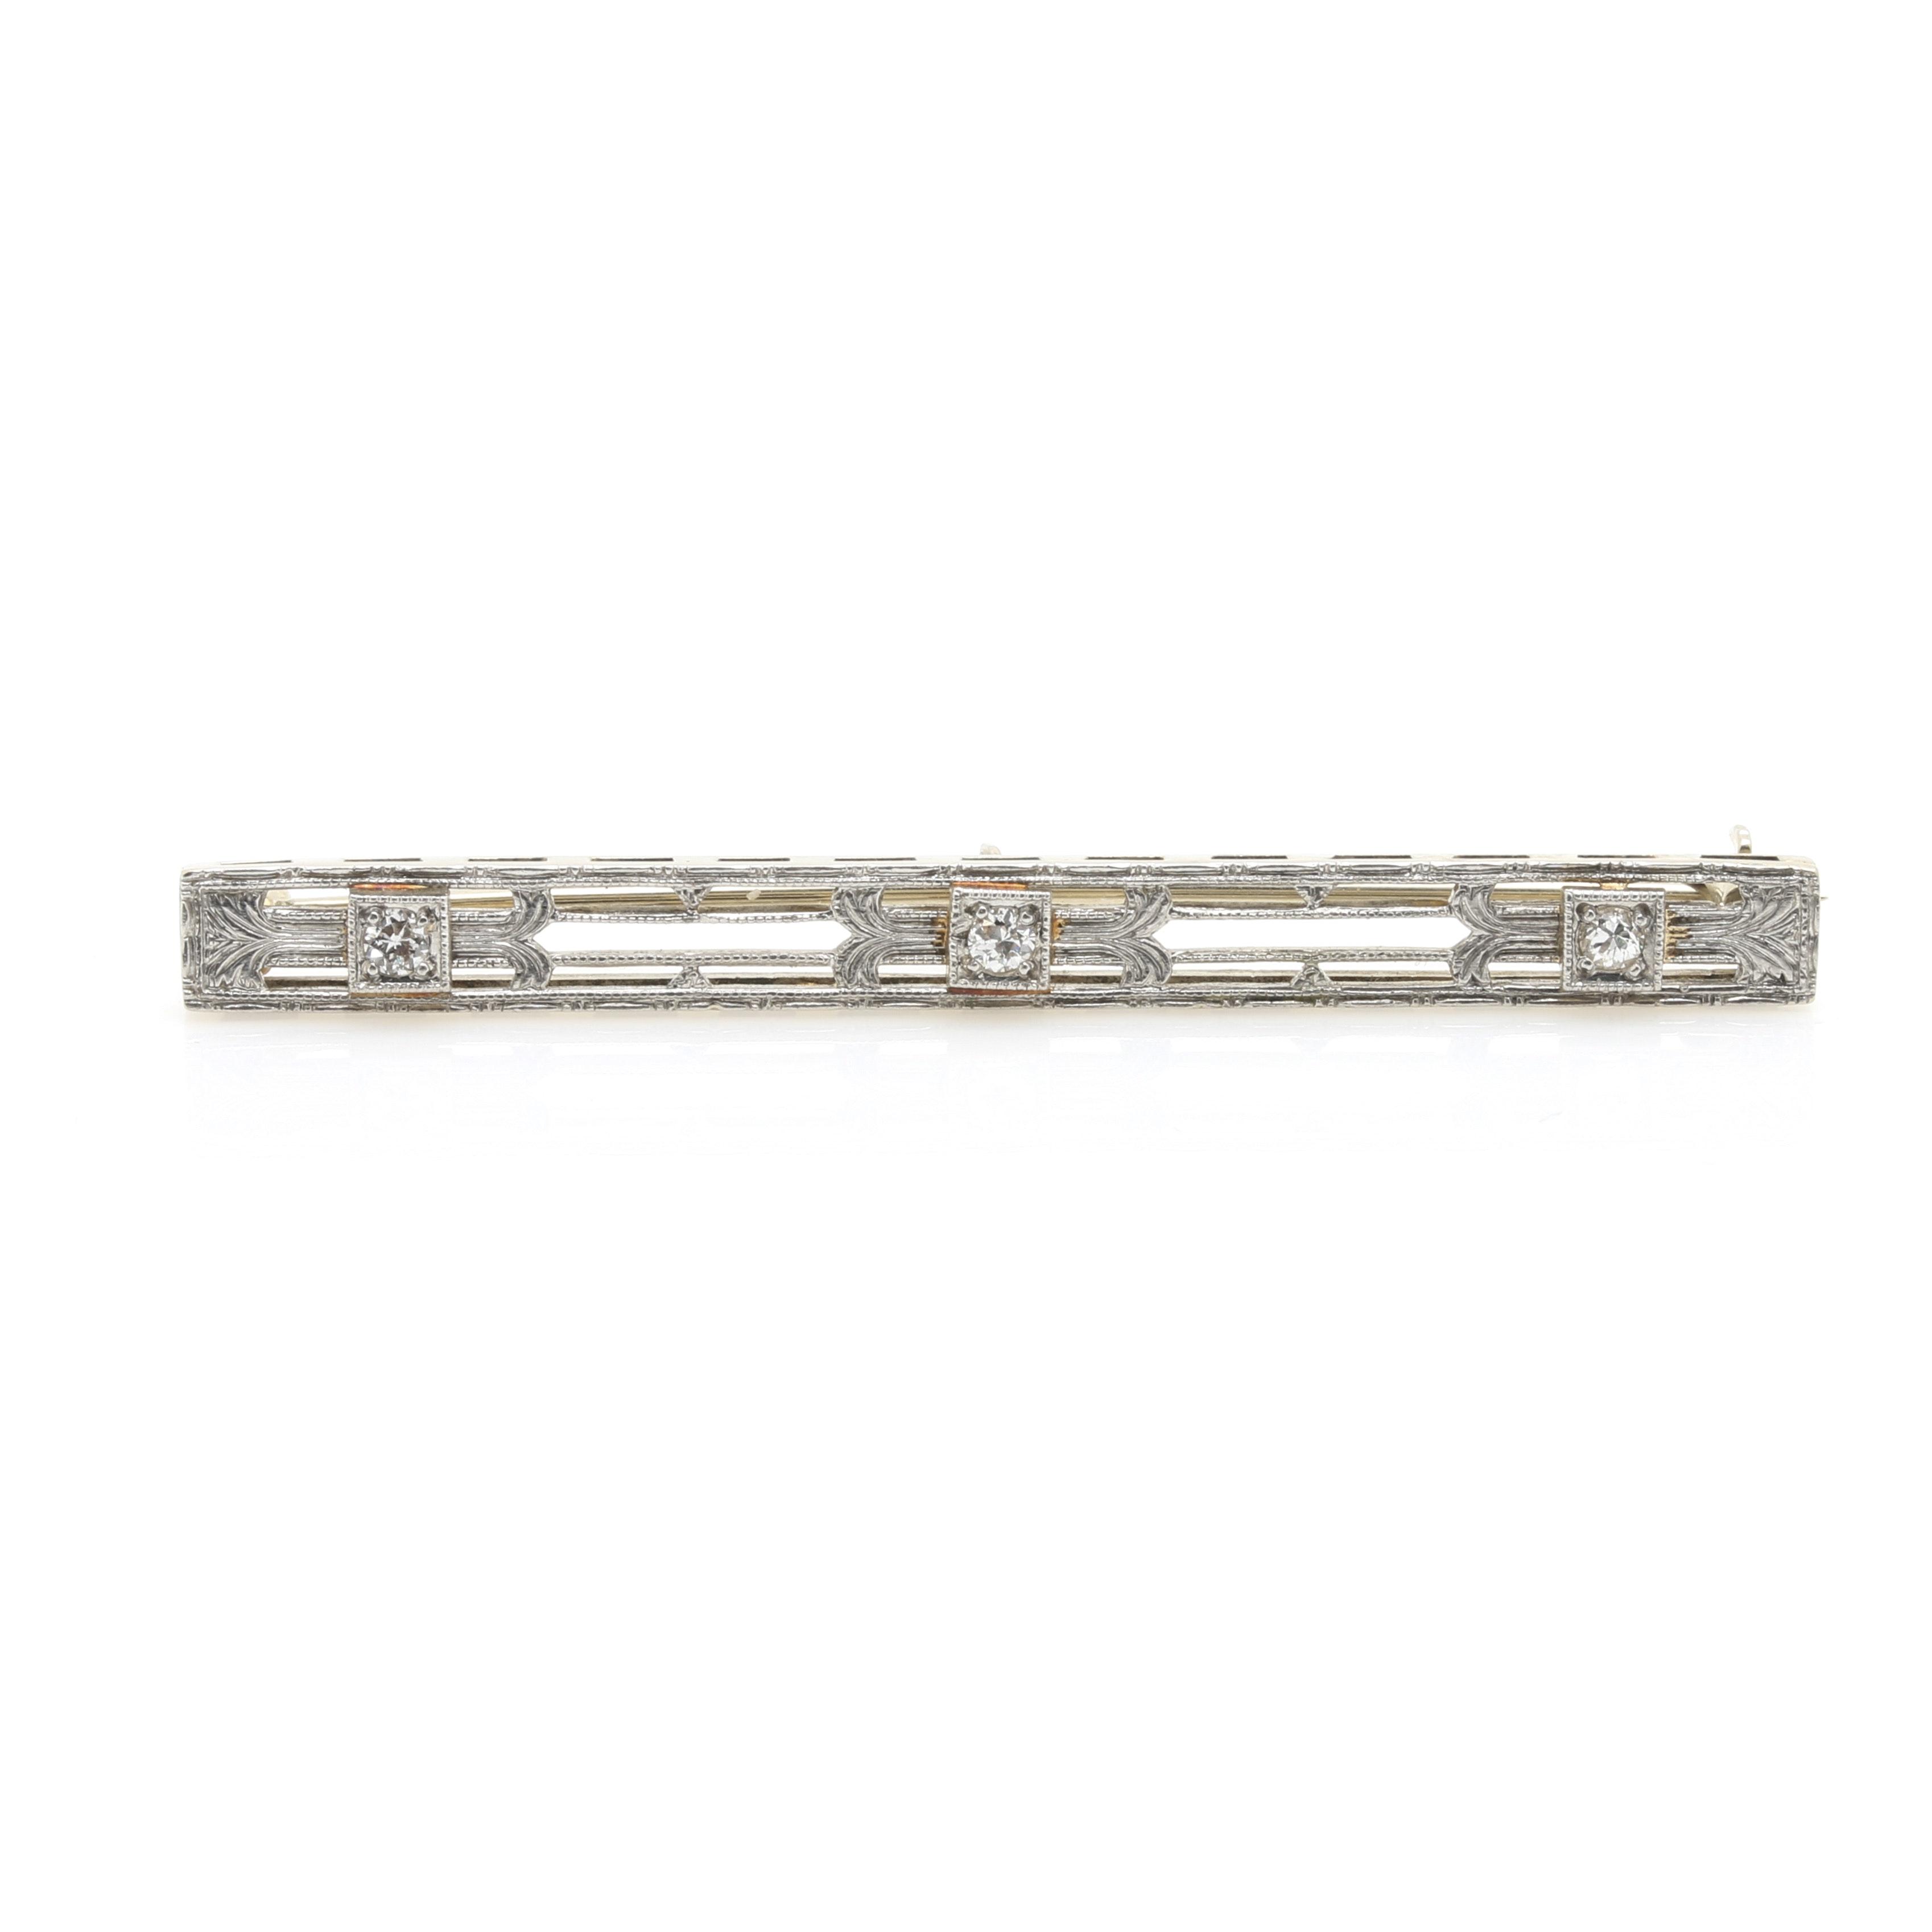 Edwardian Style 14K White Gold and Platinum Diamond Bar Pin